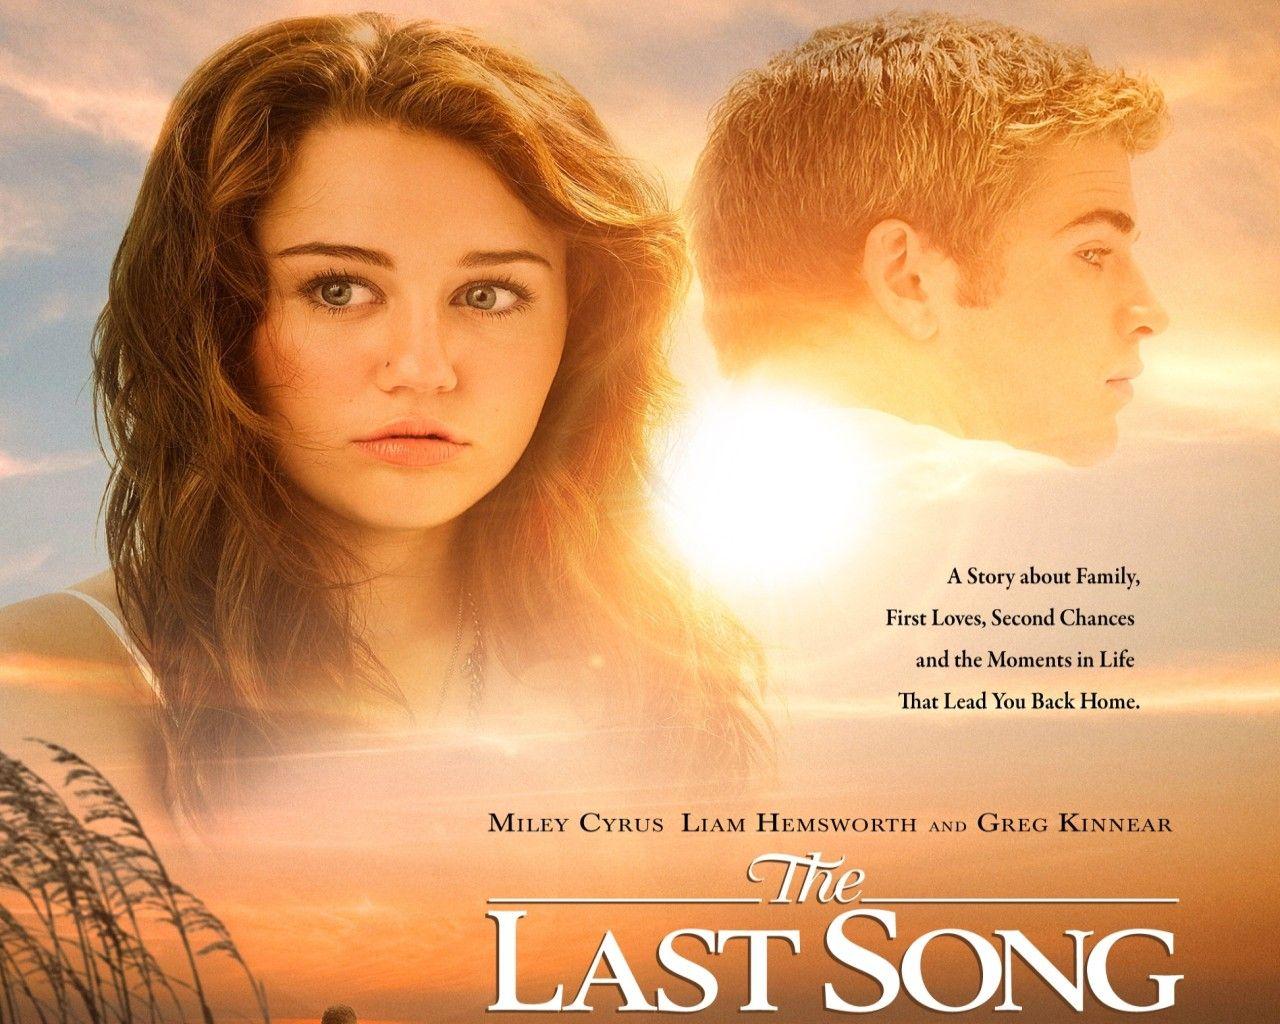 http://2.bp.blogspot.com/_QV09g9YKPd4/S8IJHgz3zoI/AAAAAAAAAIo/FY7vYYV2kzs/s1600/The_Last_Song_wallpaper.jpg